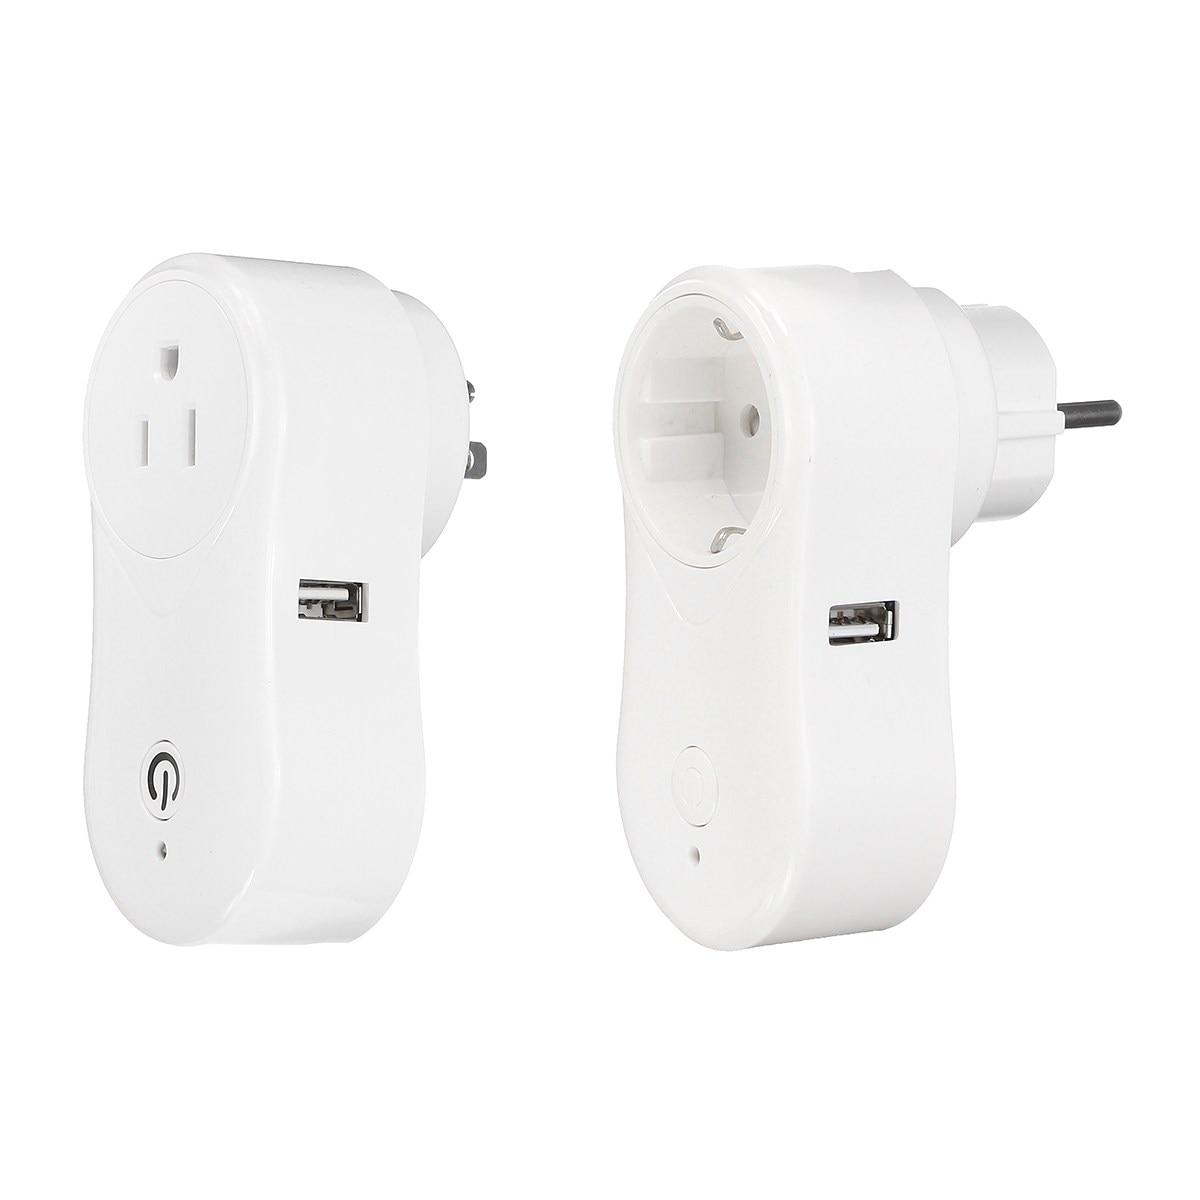 NEW WiFi Wireless Remote Control Smart Switch Socket Outlet Plug For Amazon Alexa Building Automation 3 pack wireless remote control power outlet switch plug socket infrared heater panel wireless socket